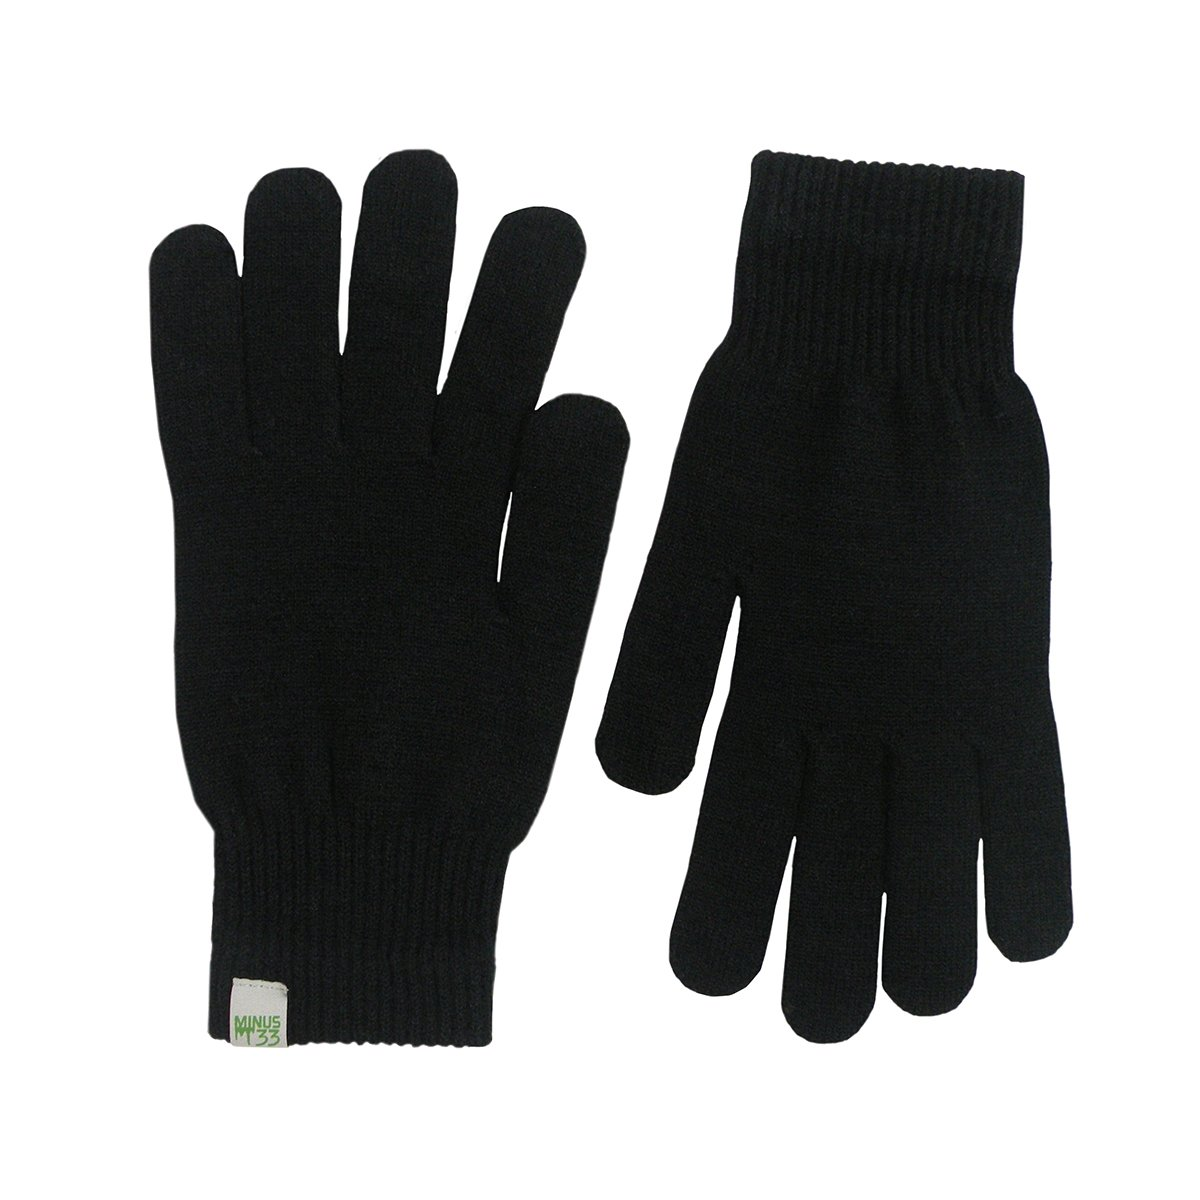 Minus33 Merino Wool Glove Liner Black, Black, Small